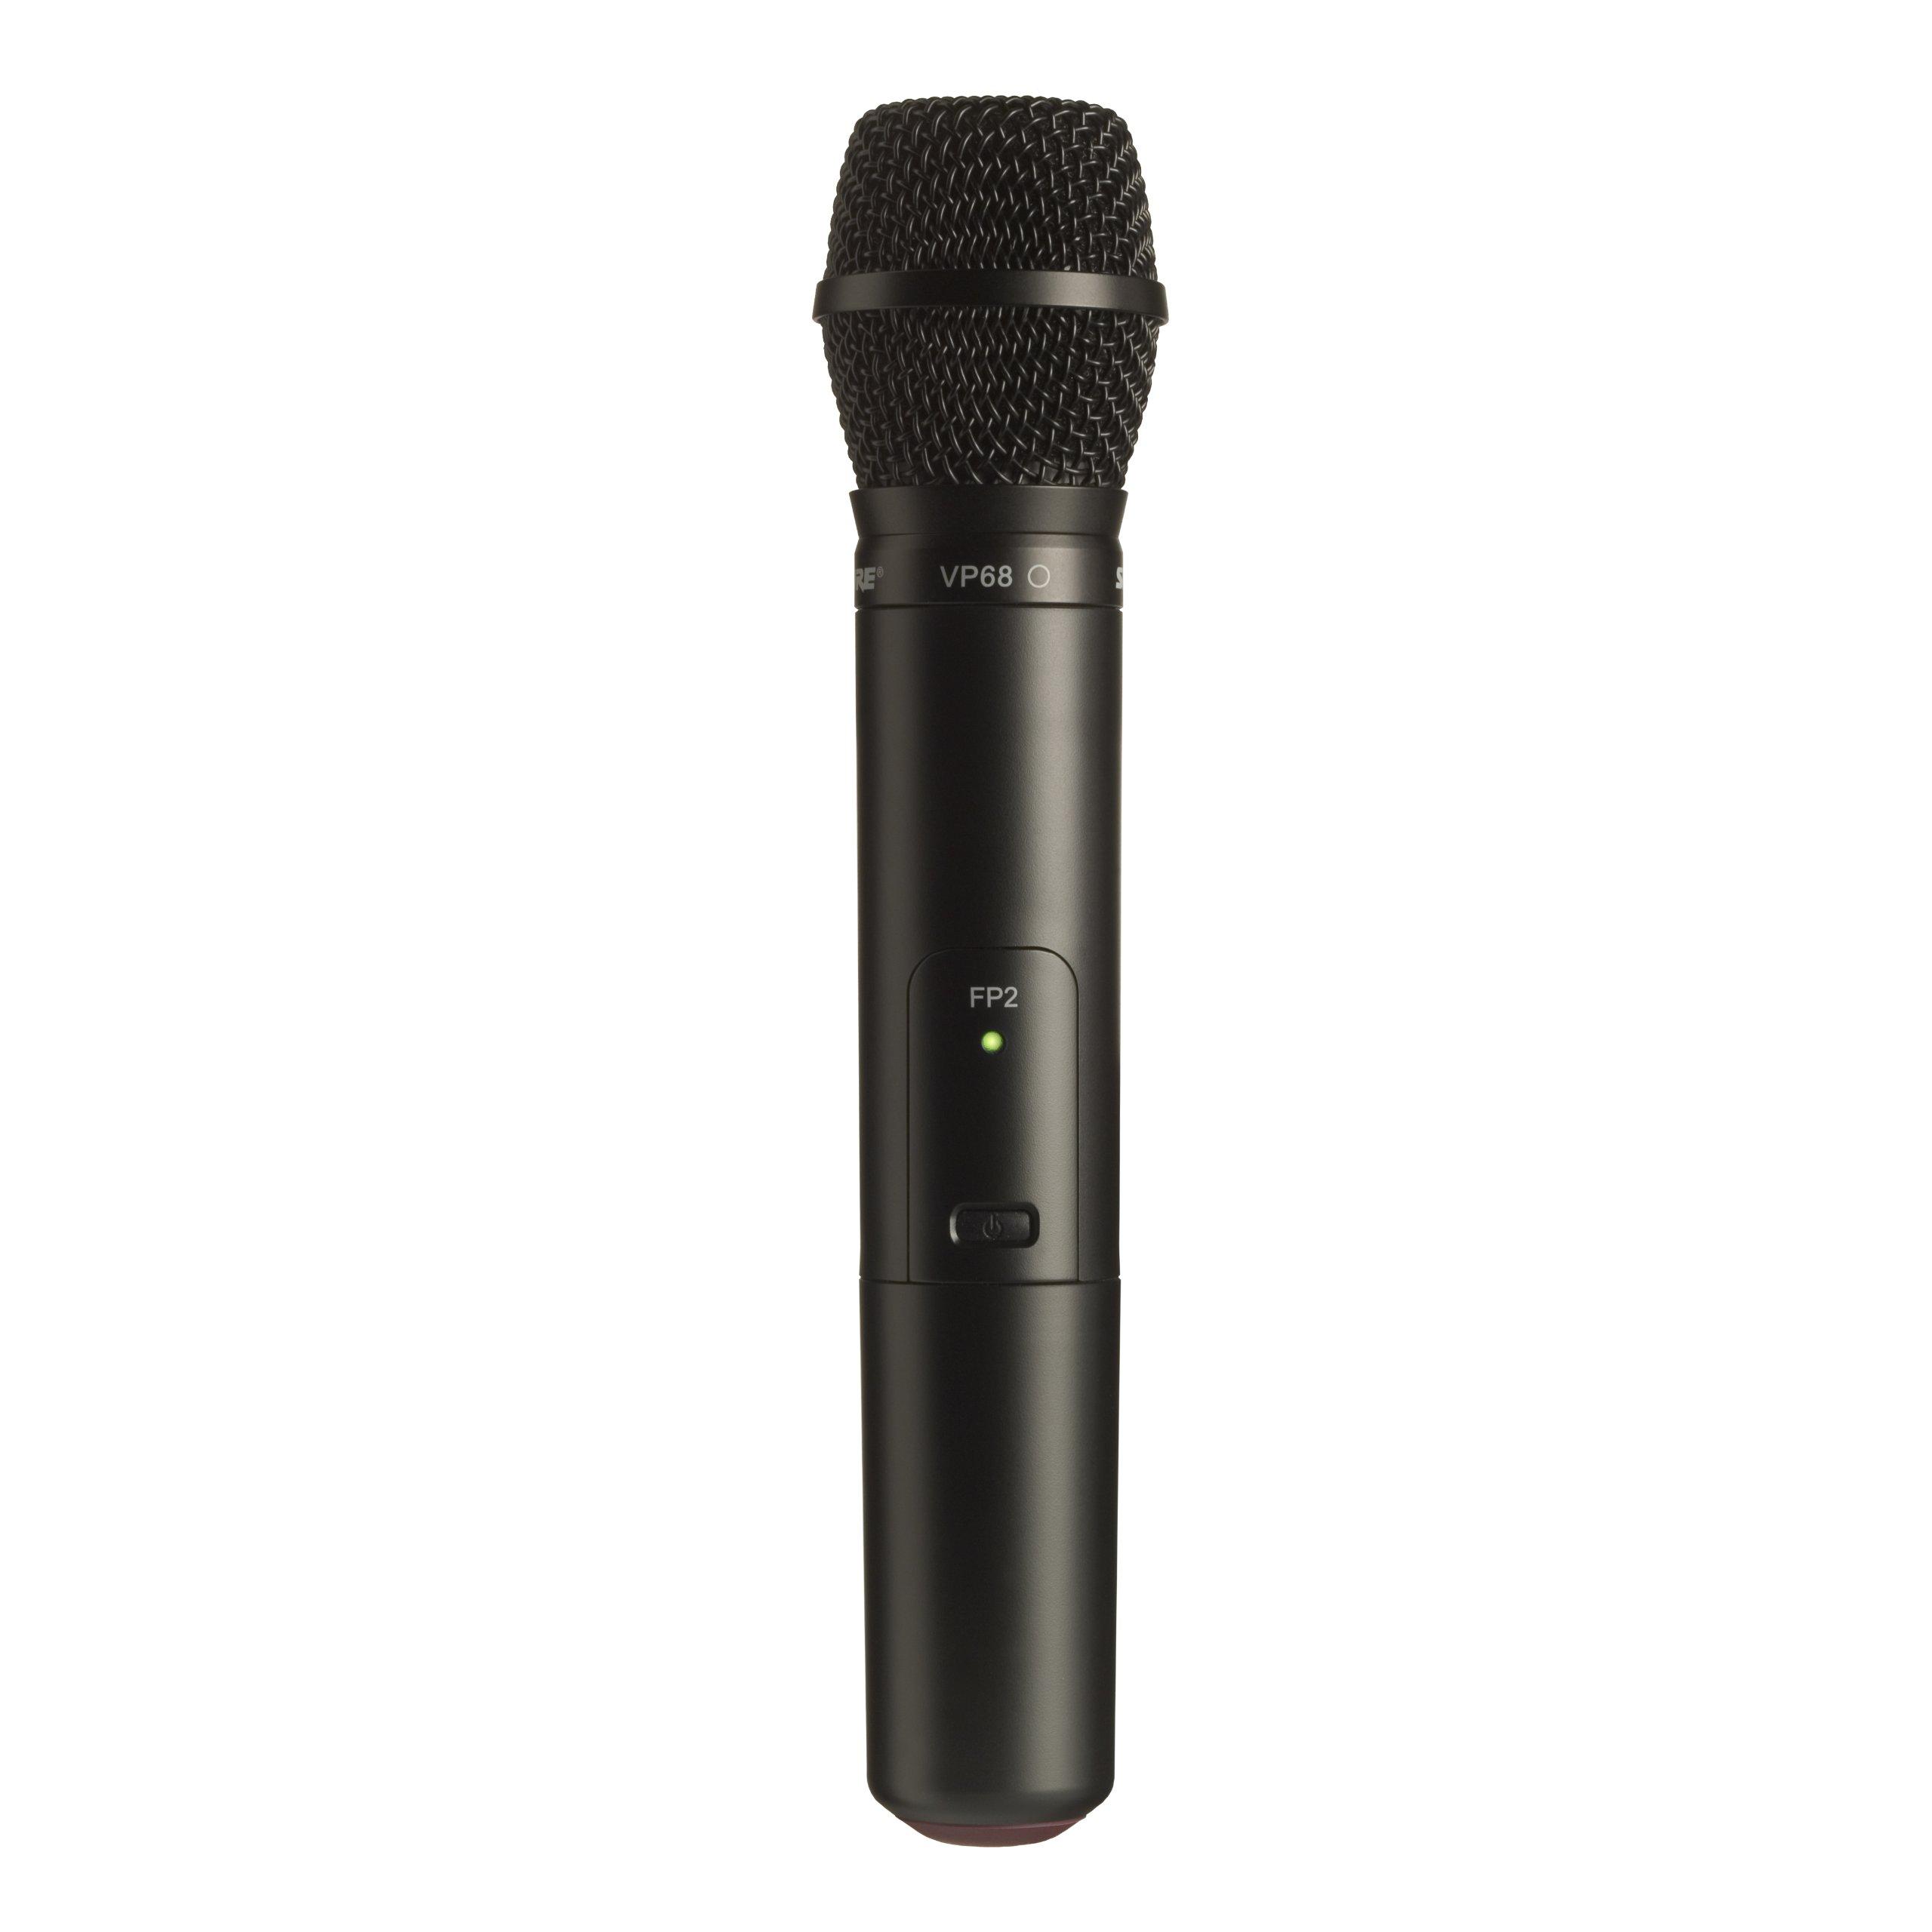 Microfono Shure FP2/VP68 Combo Wireless System, G4...